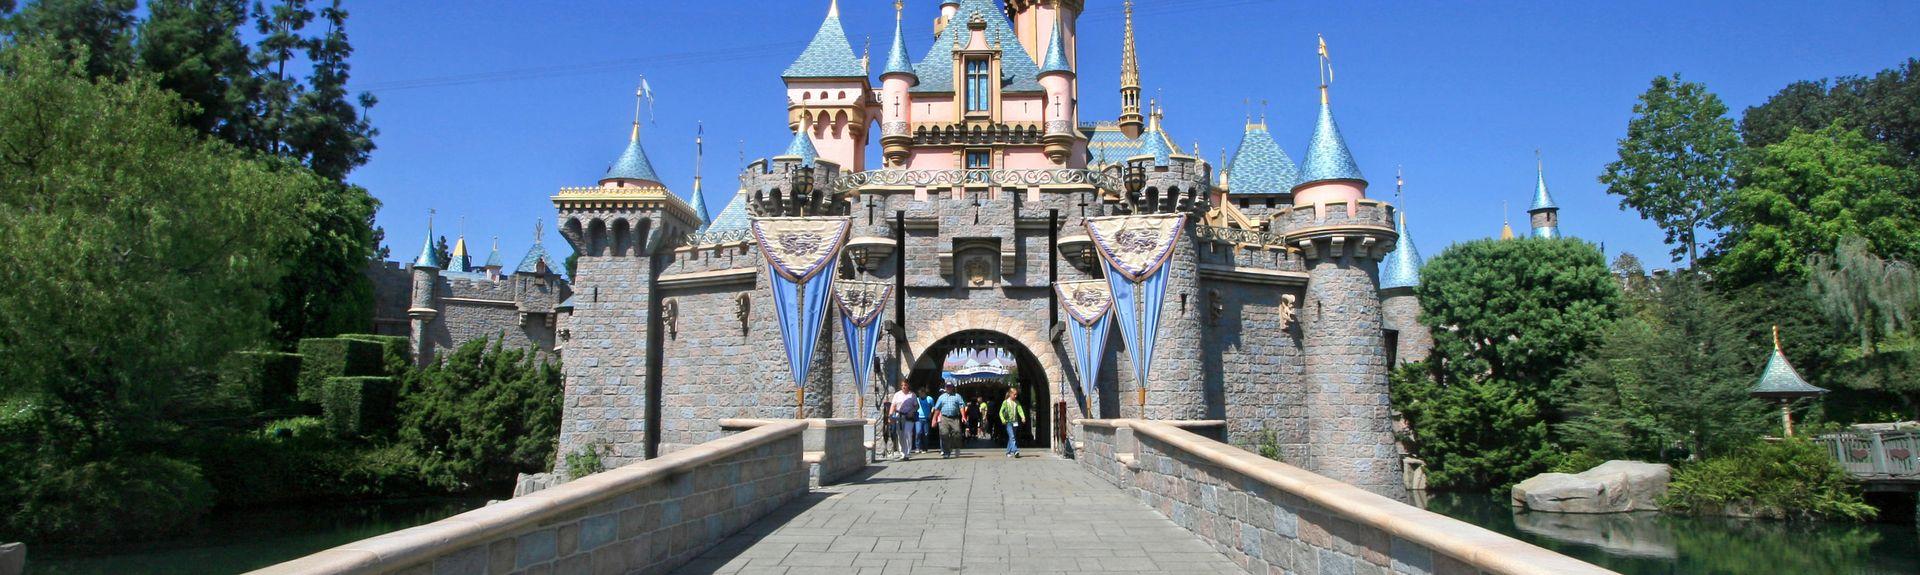 Disneyland®, Anaheim, California, United States of America